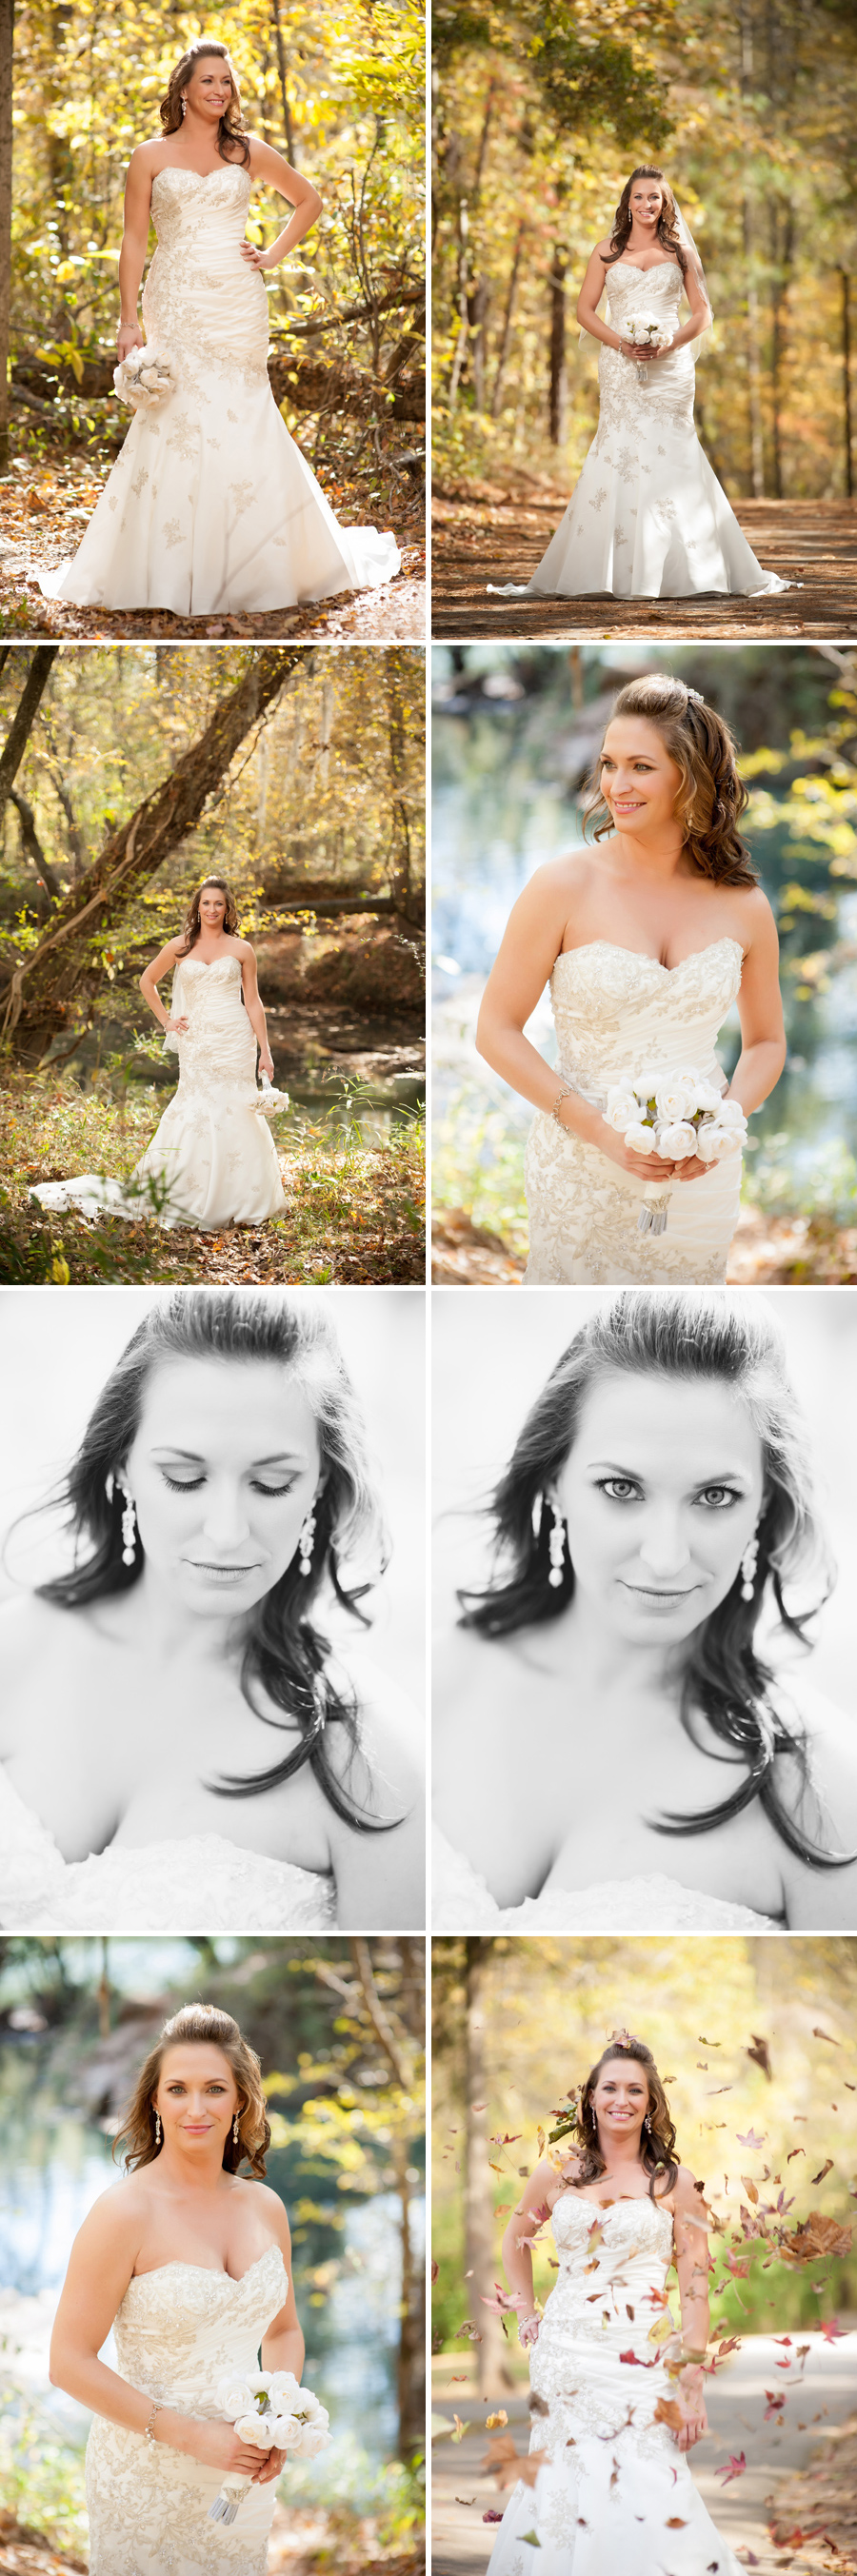 Ashley bridal portrait Columbia, SC